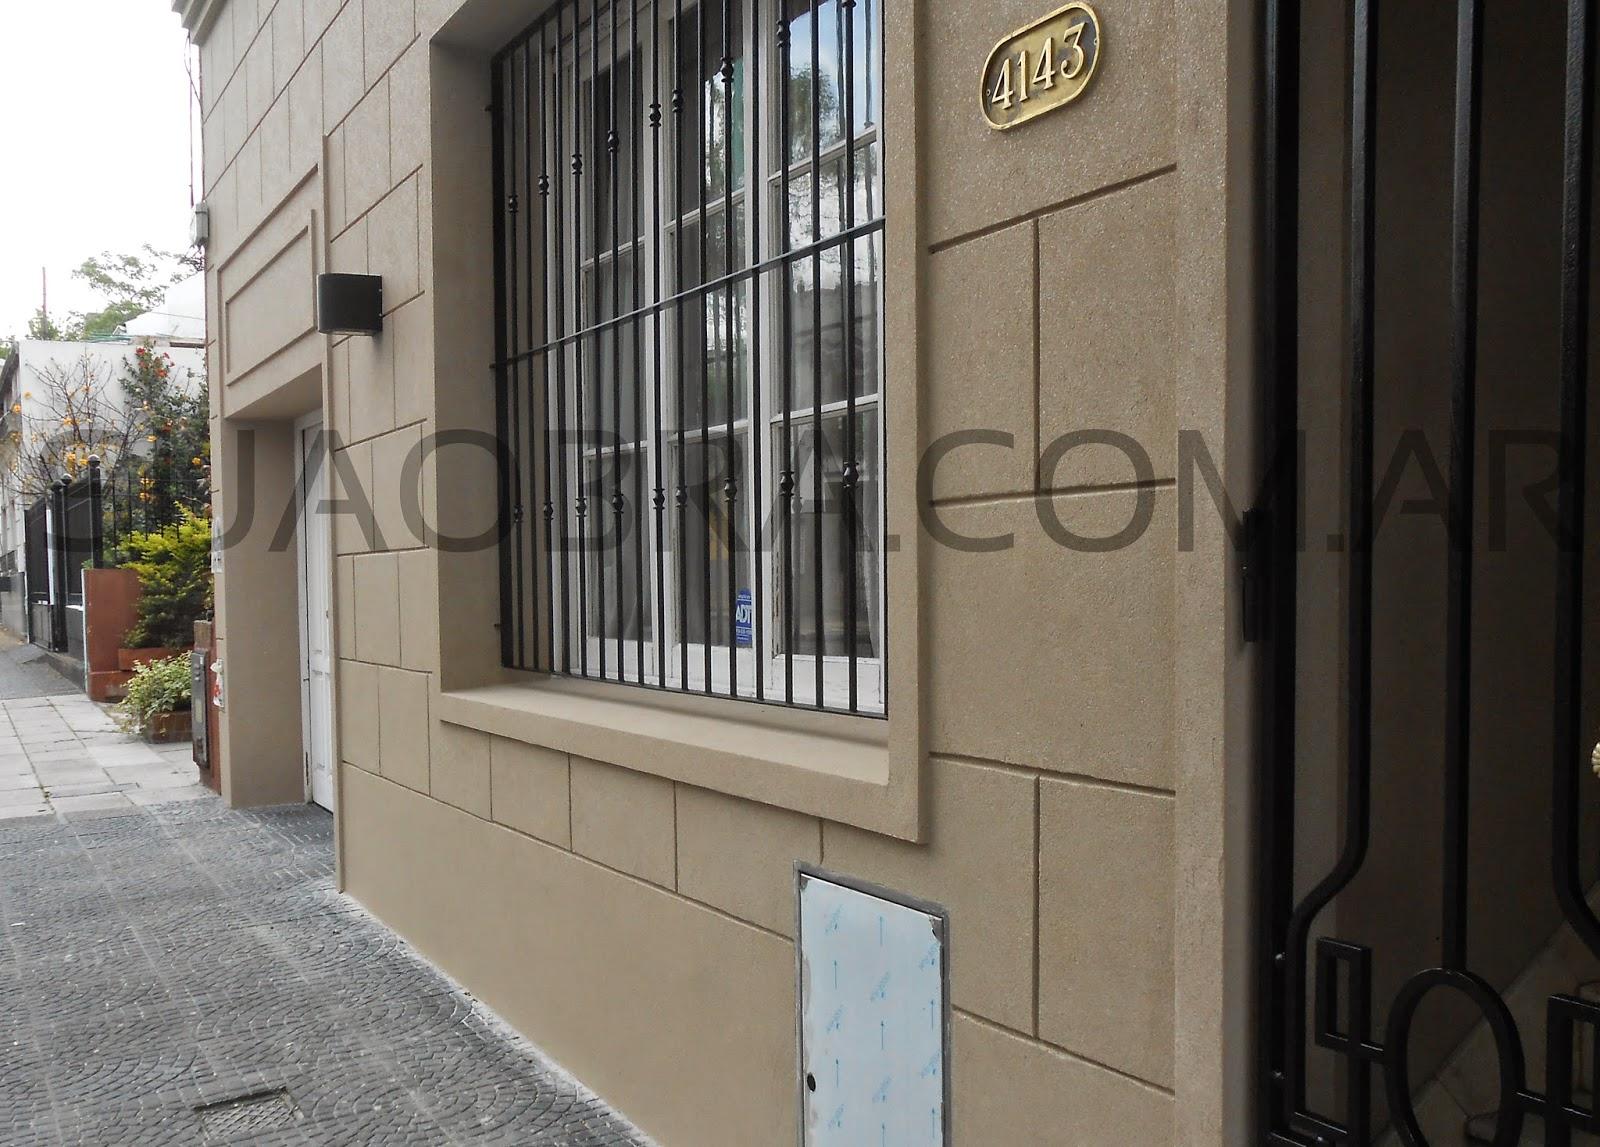 Tarquini revestimiento de paredes exteriores aplicacion for Revestimiento para paredes